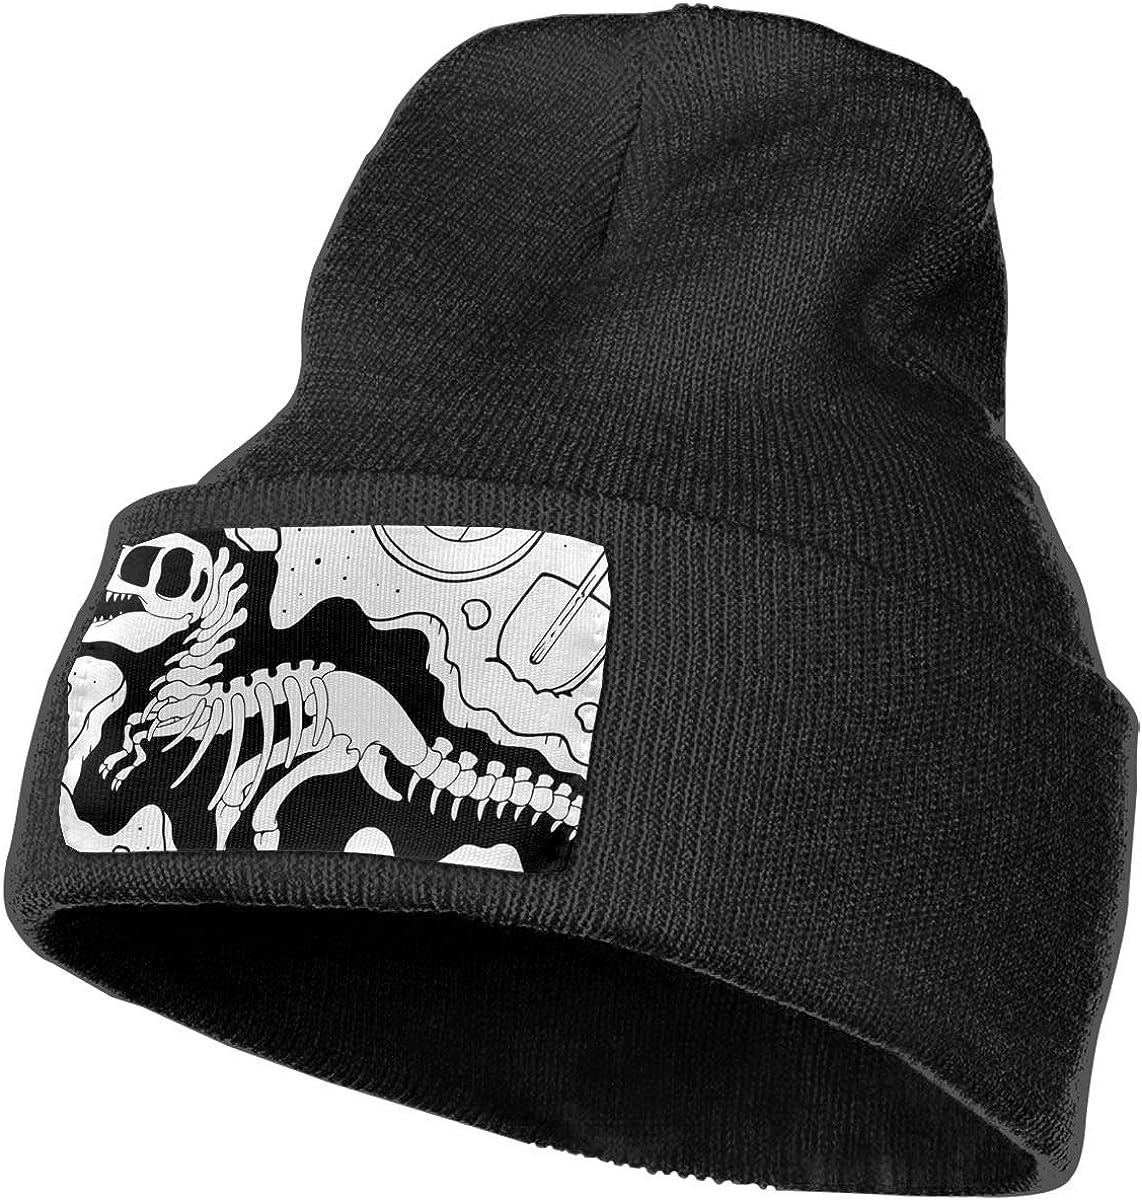 100/% Acrylic Acid Mas Beanie Hat Ruin Dinosaurs Bones Fashion Knitting Hat for Men Women